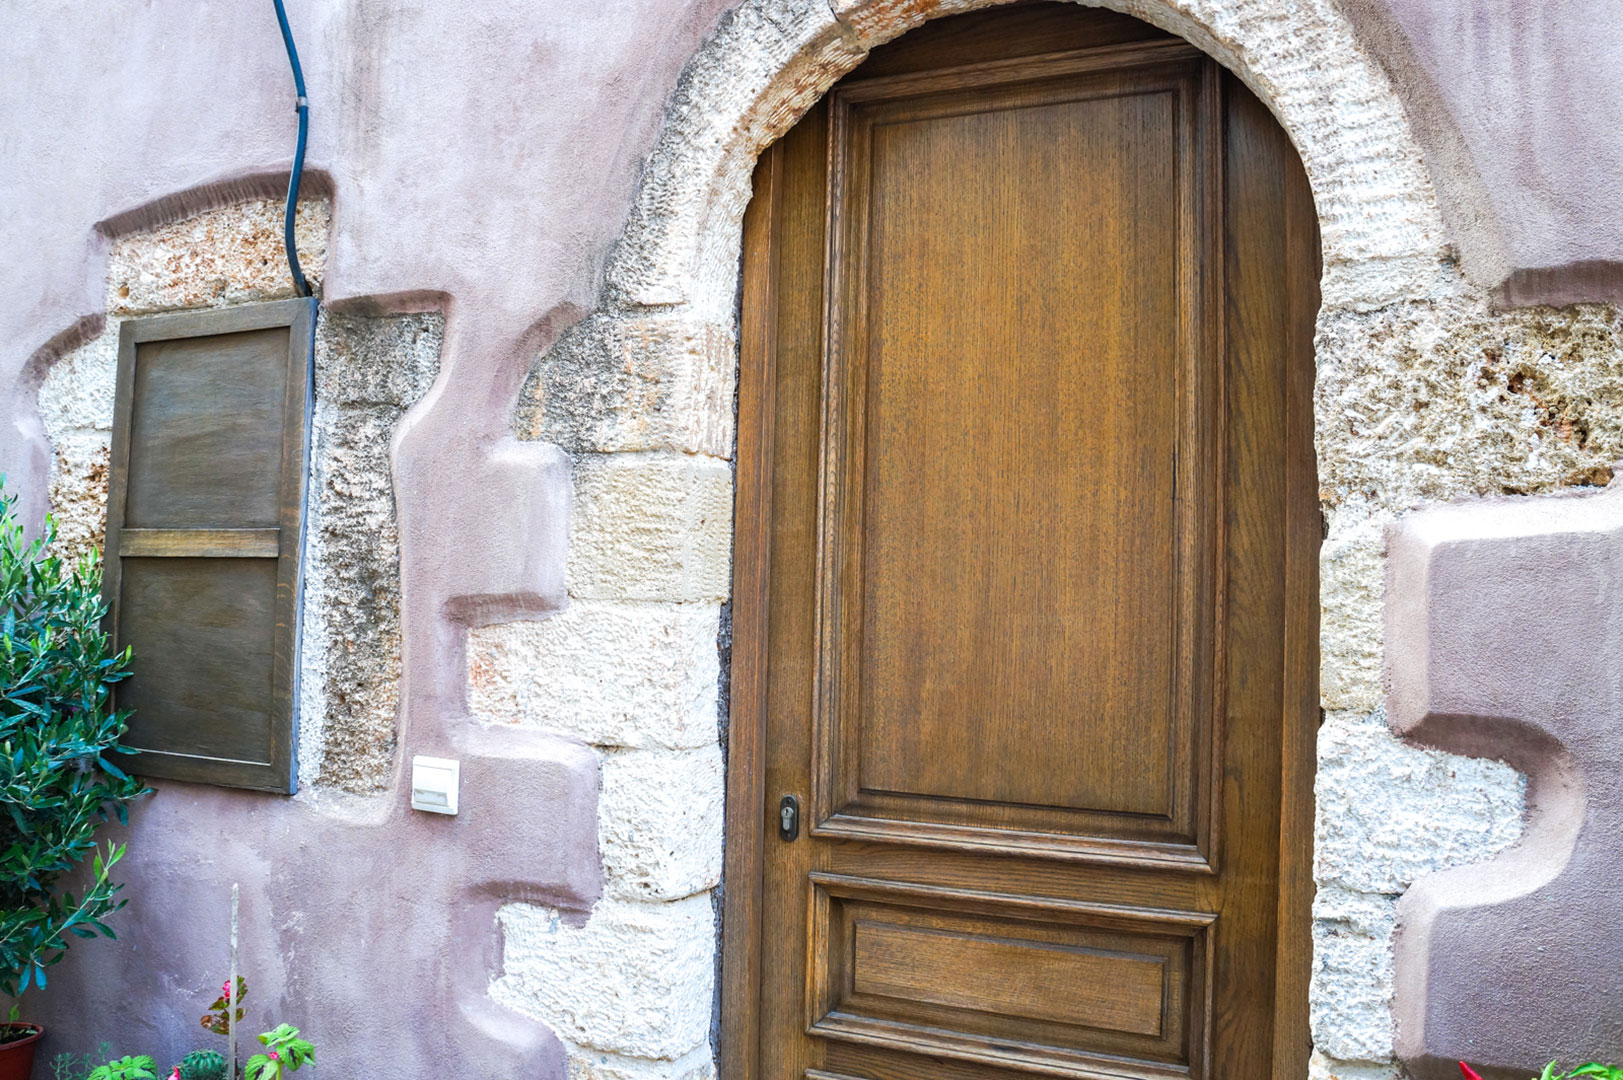 chania-crete-greece-la-vie-en-blog-all-rights-reserved-9